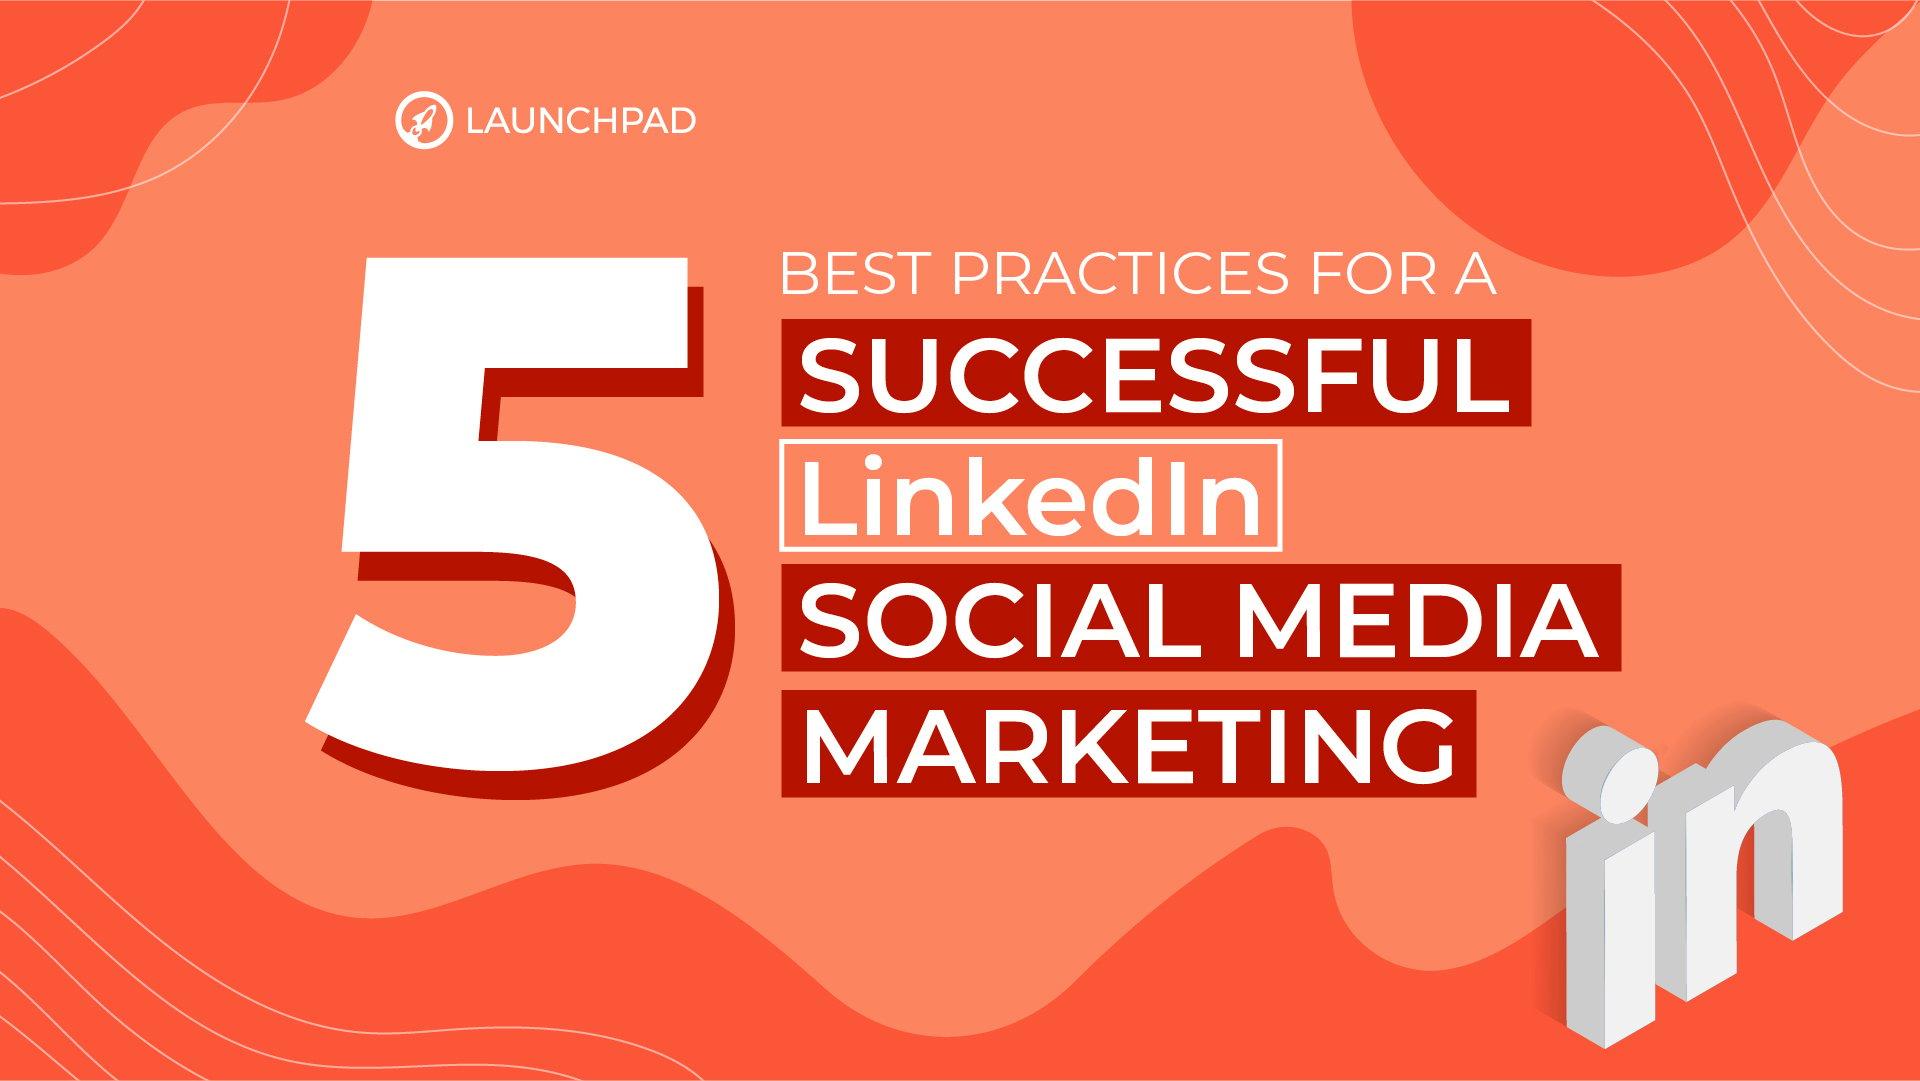 Blog[SM]-5 Best Practices for a Successful LinkedIn Social Media Marketing-02